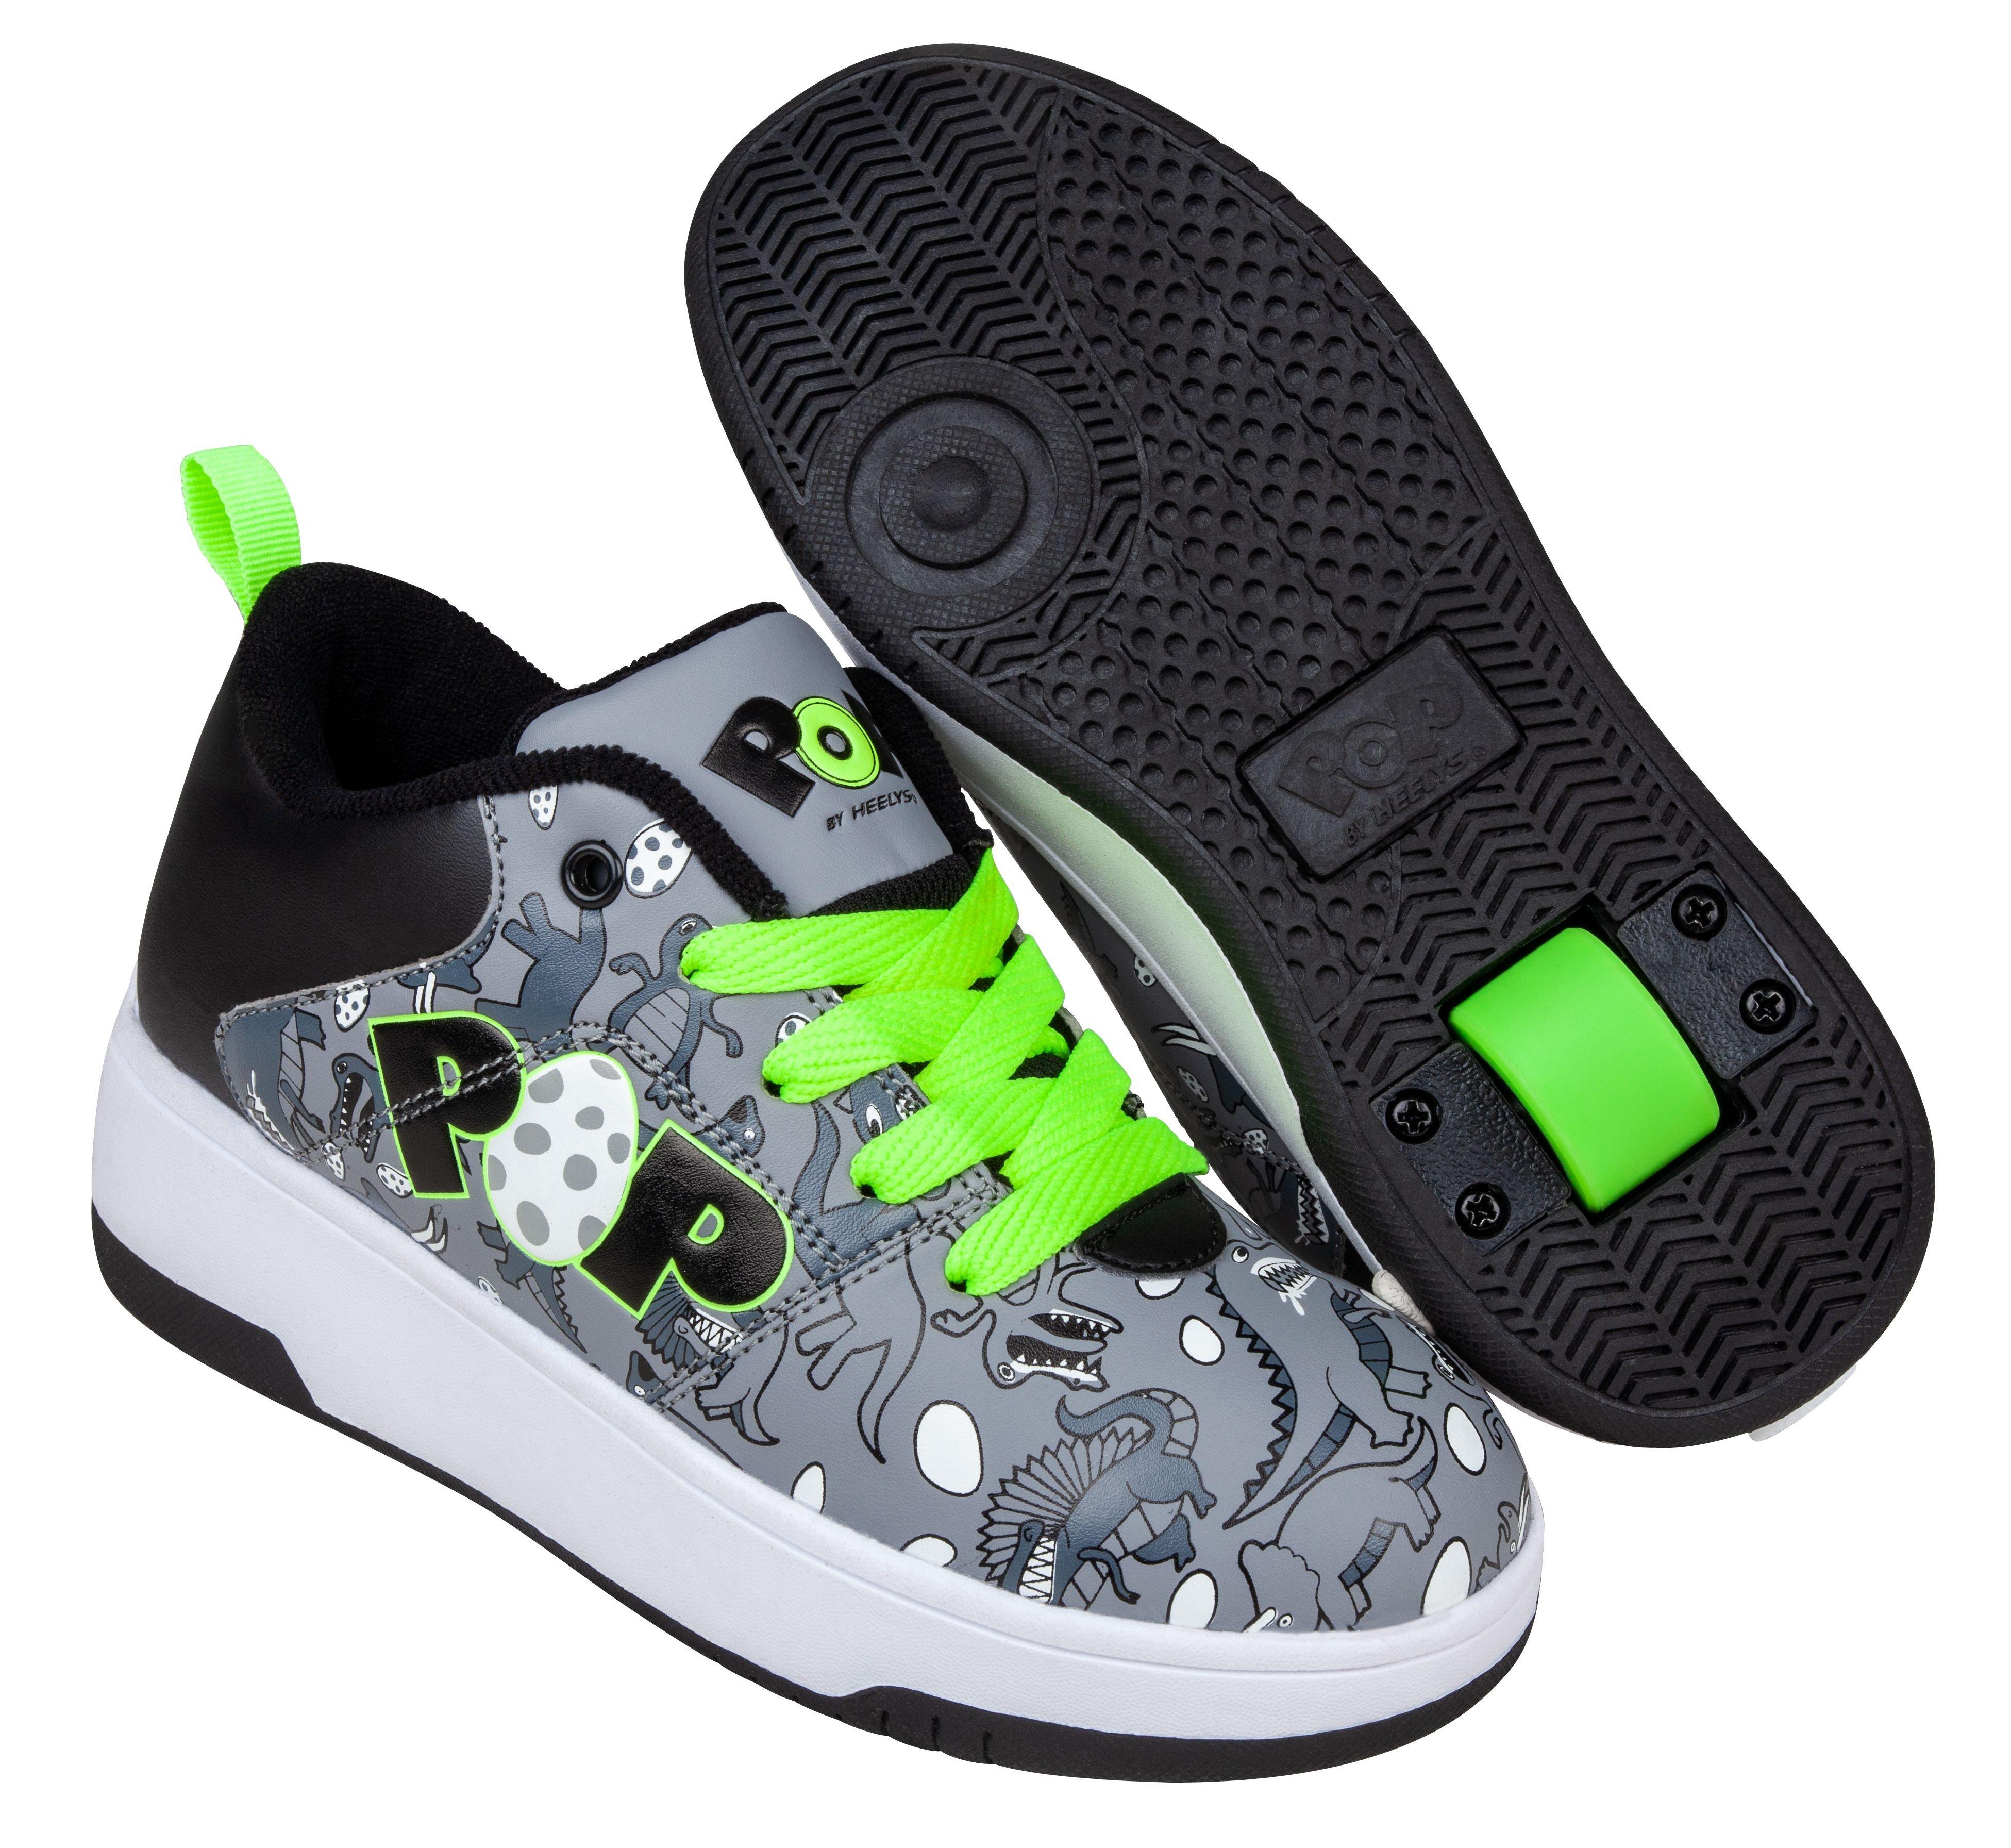 Heelys - POP Shoes - Charcoal (size 33) (POP-B1W-0082)